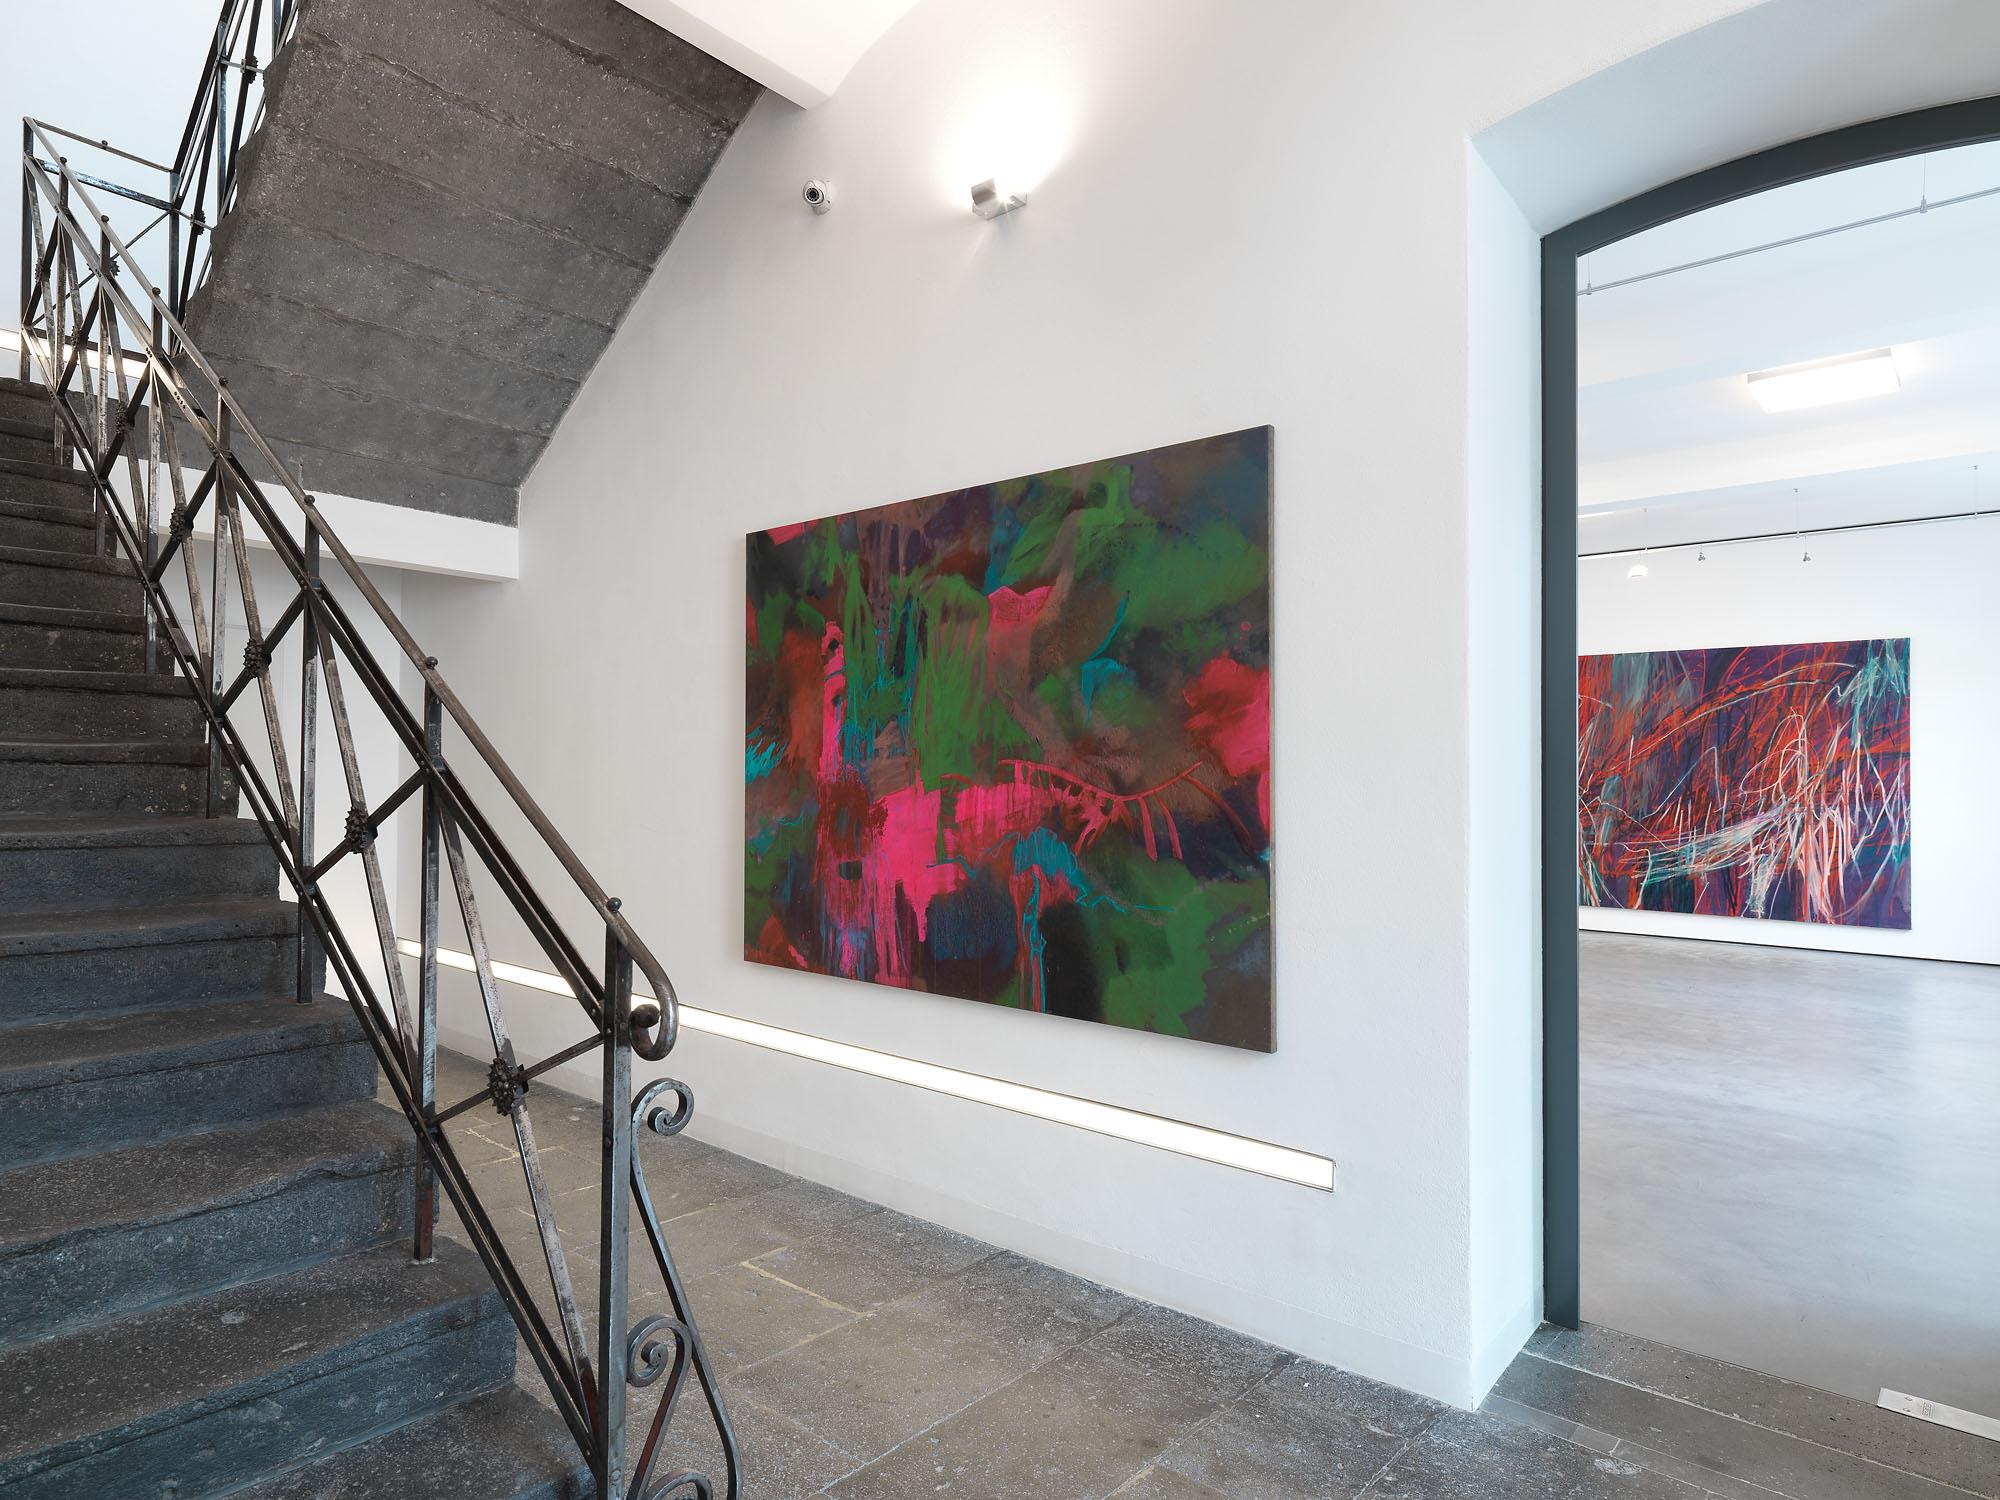 Instalationview, Sabrina Haunsperg, Galerie Judith Andreae, Bonn, Germany(2)